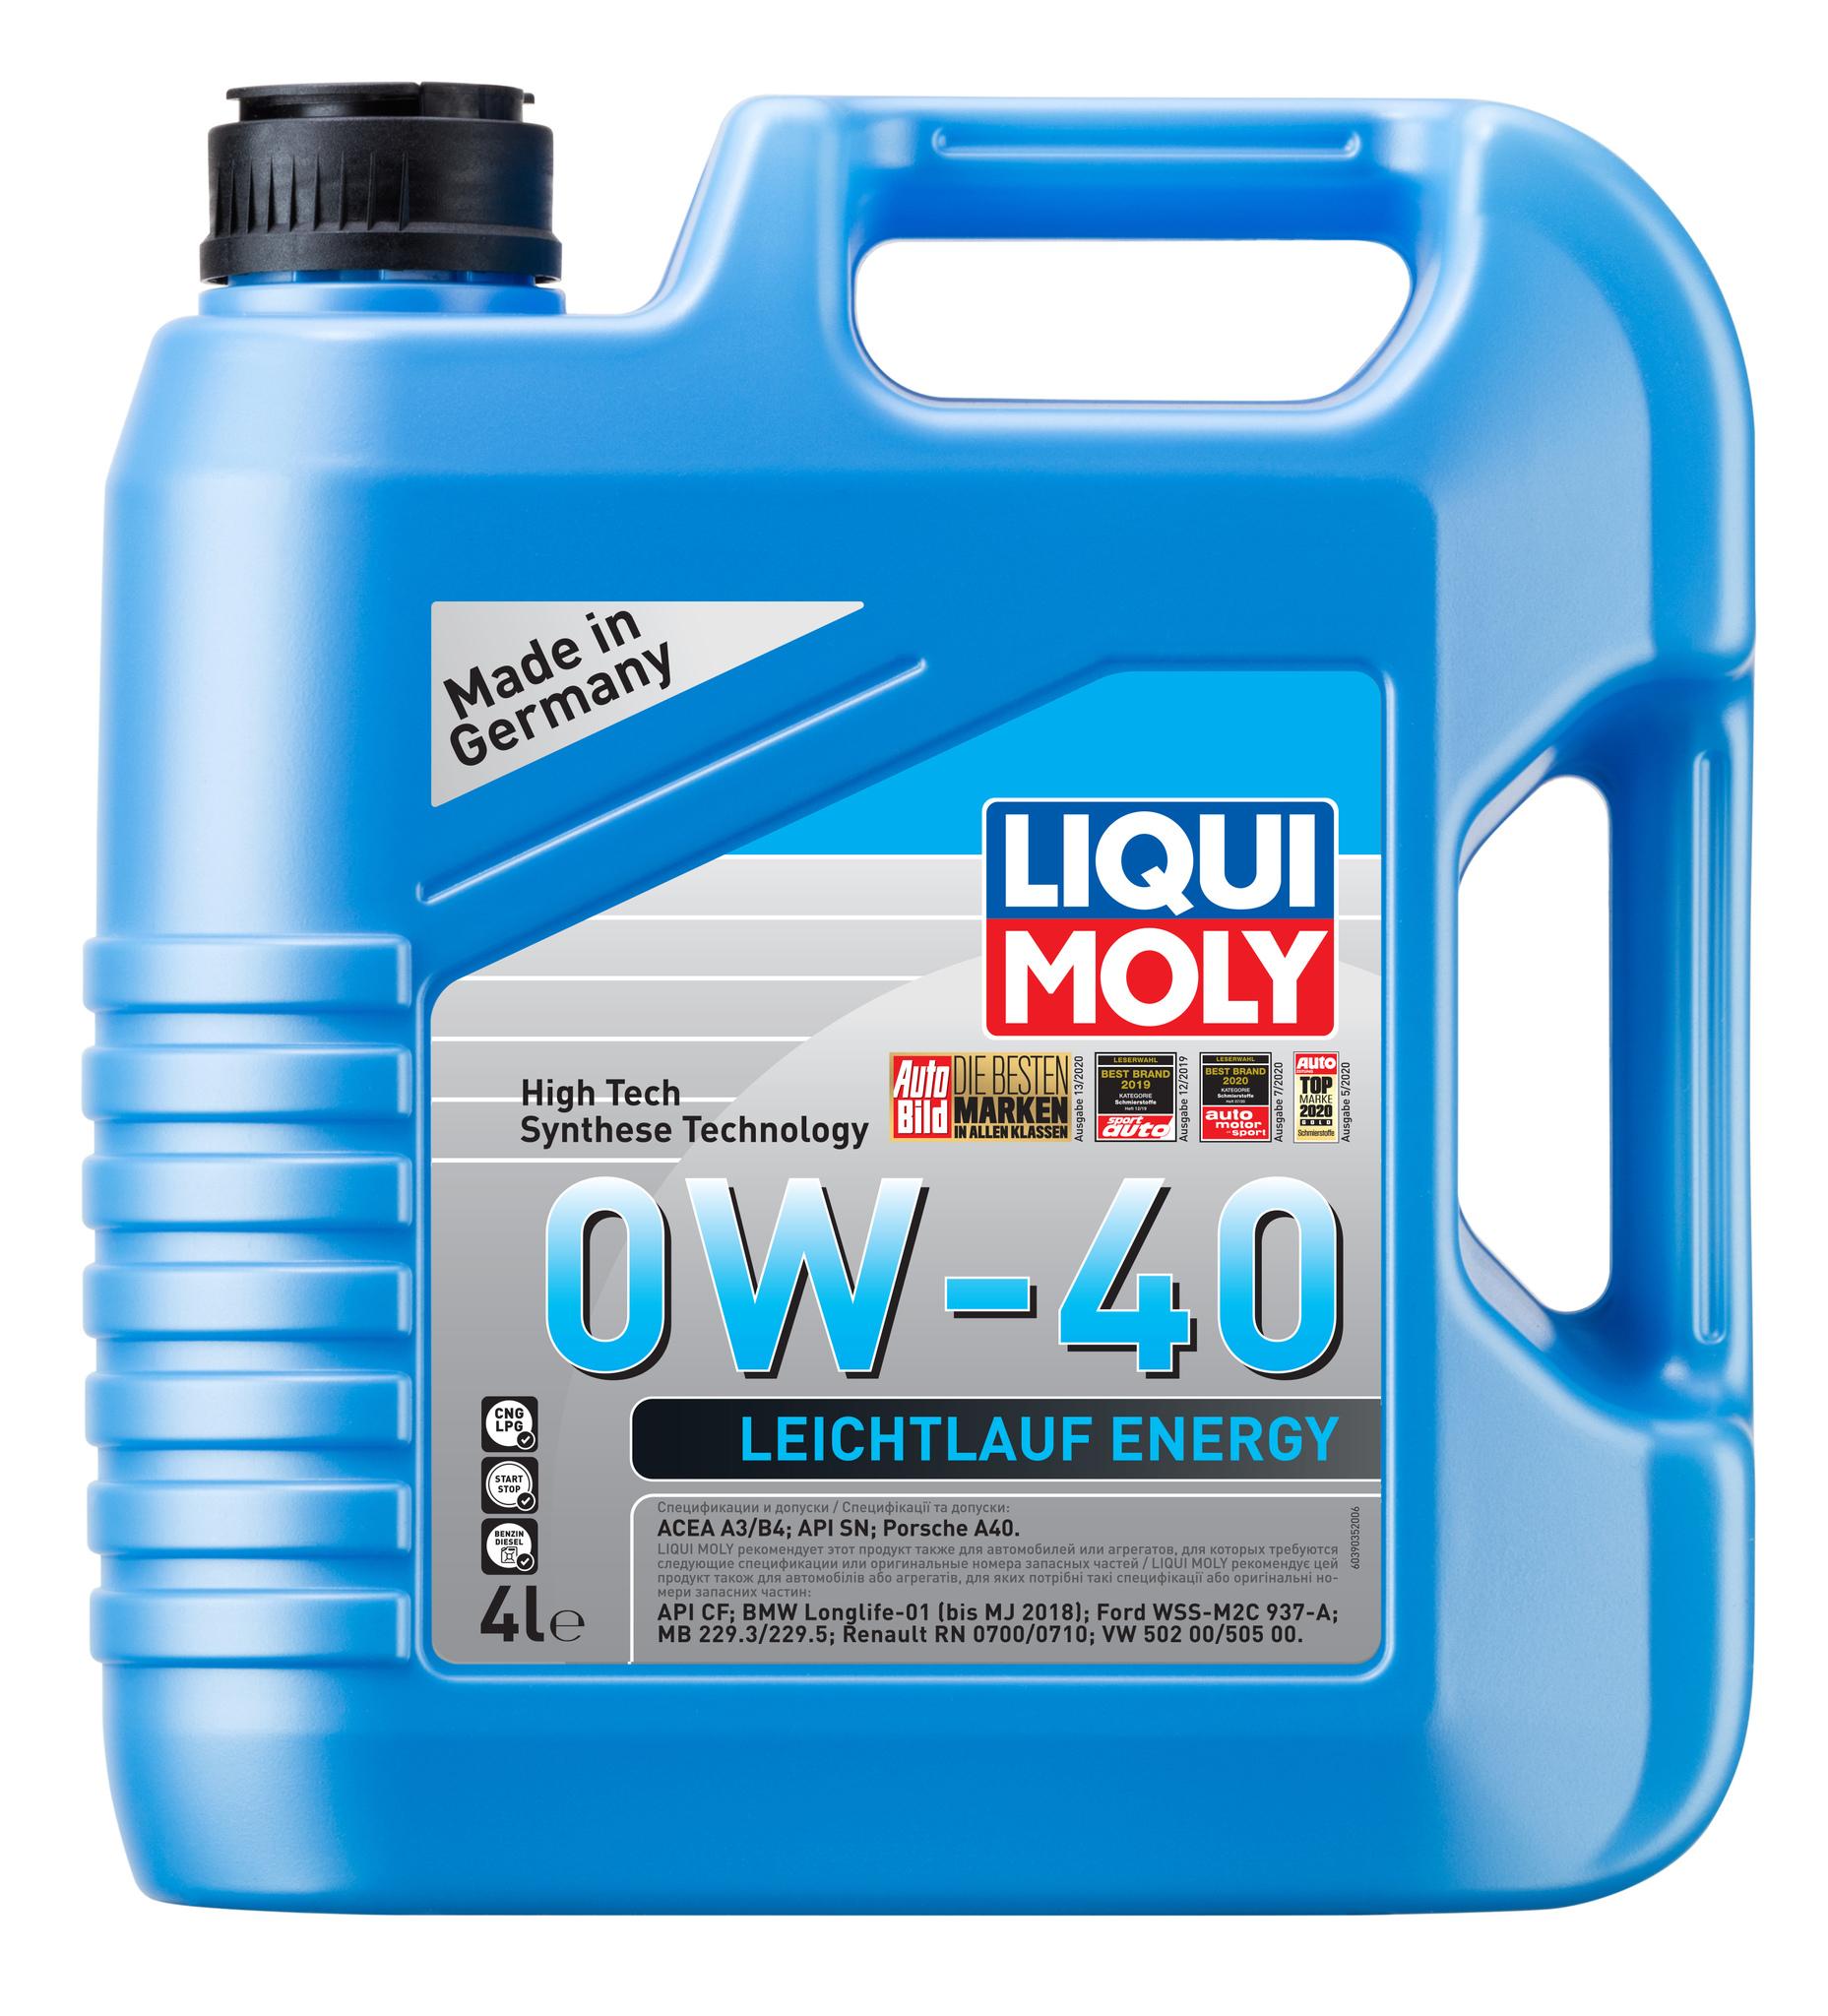 Liqui Moly Leiсhtlauf Energy 0W40 НС-синтетическое моторное масло